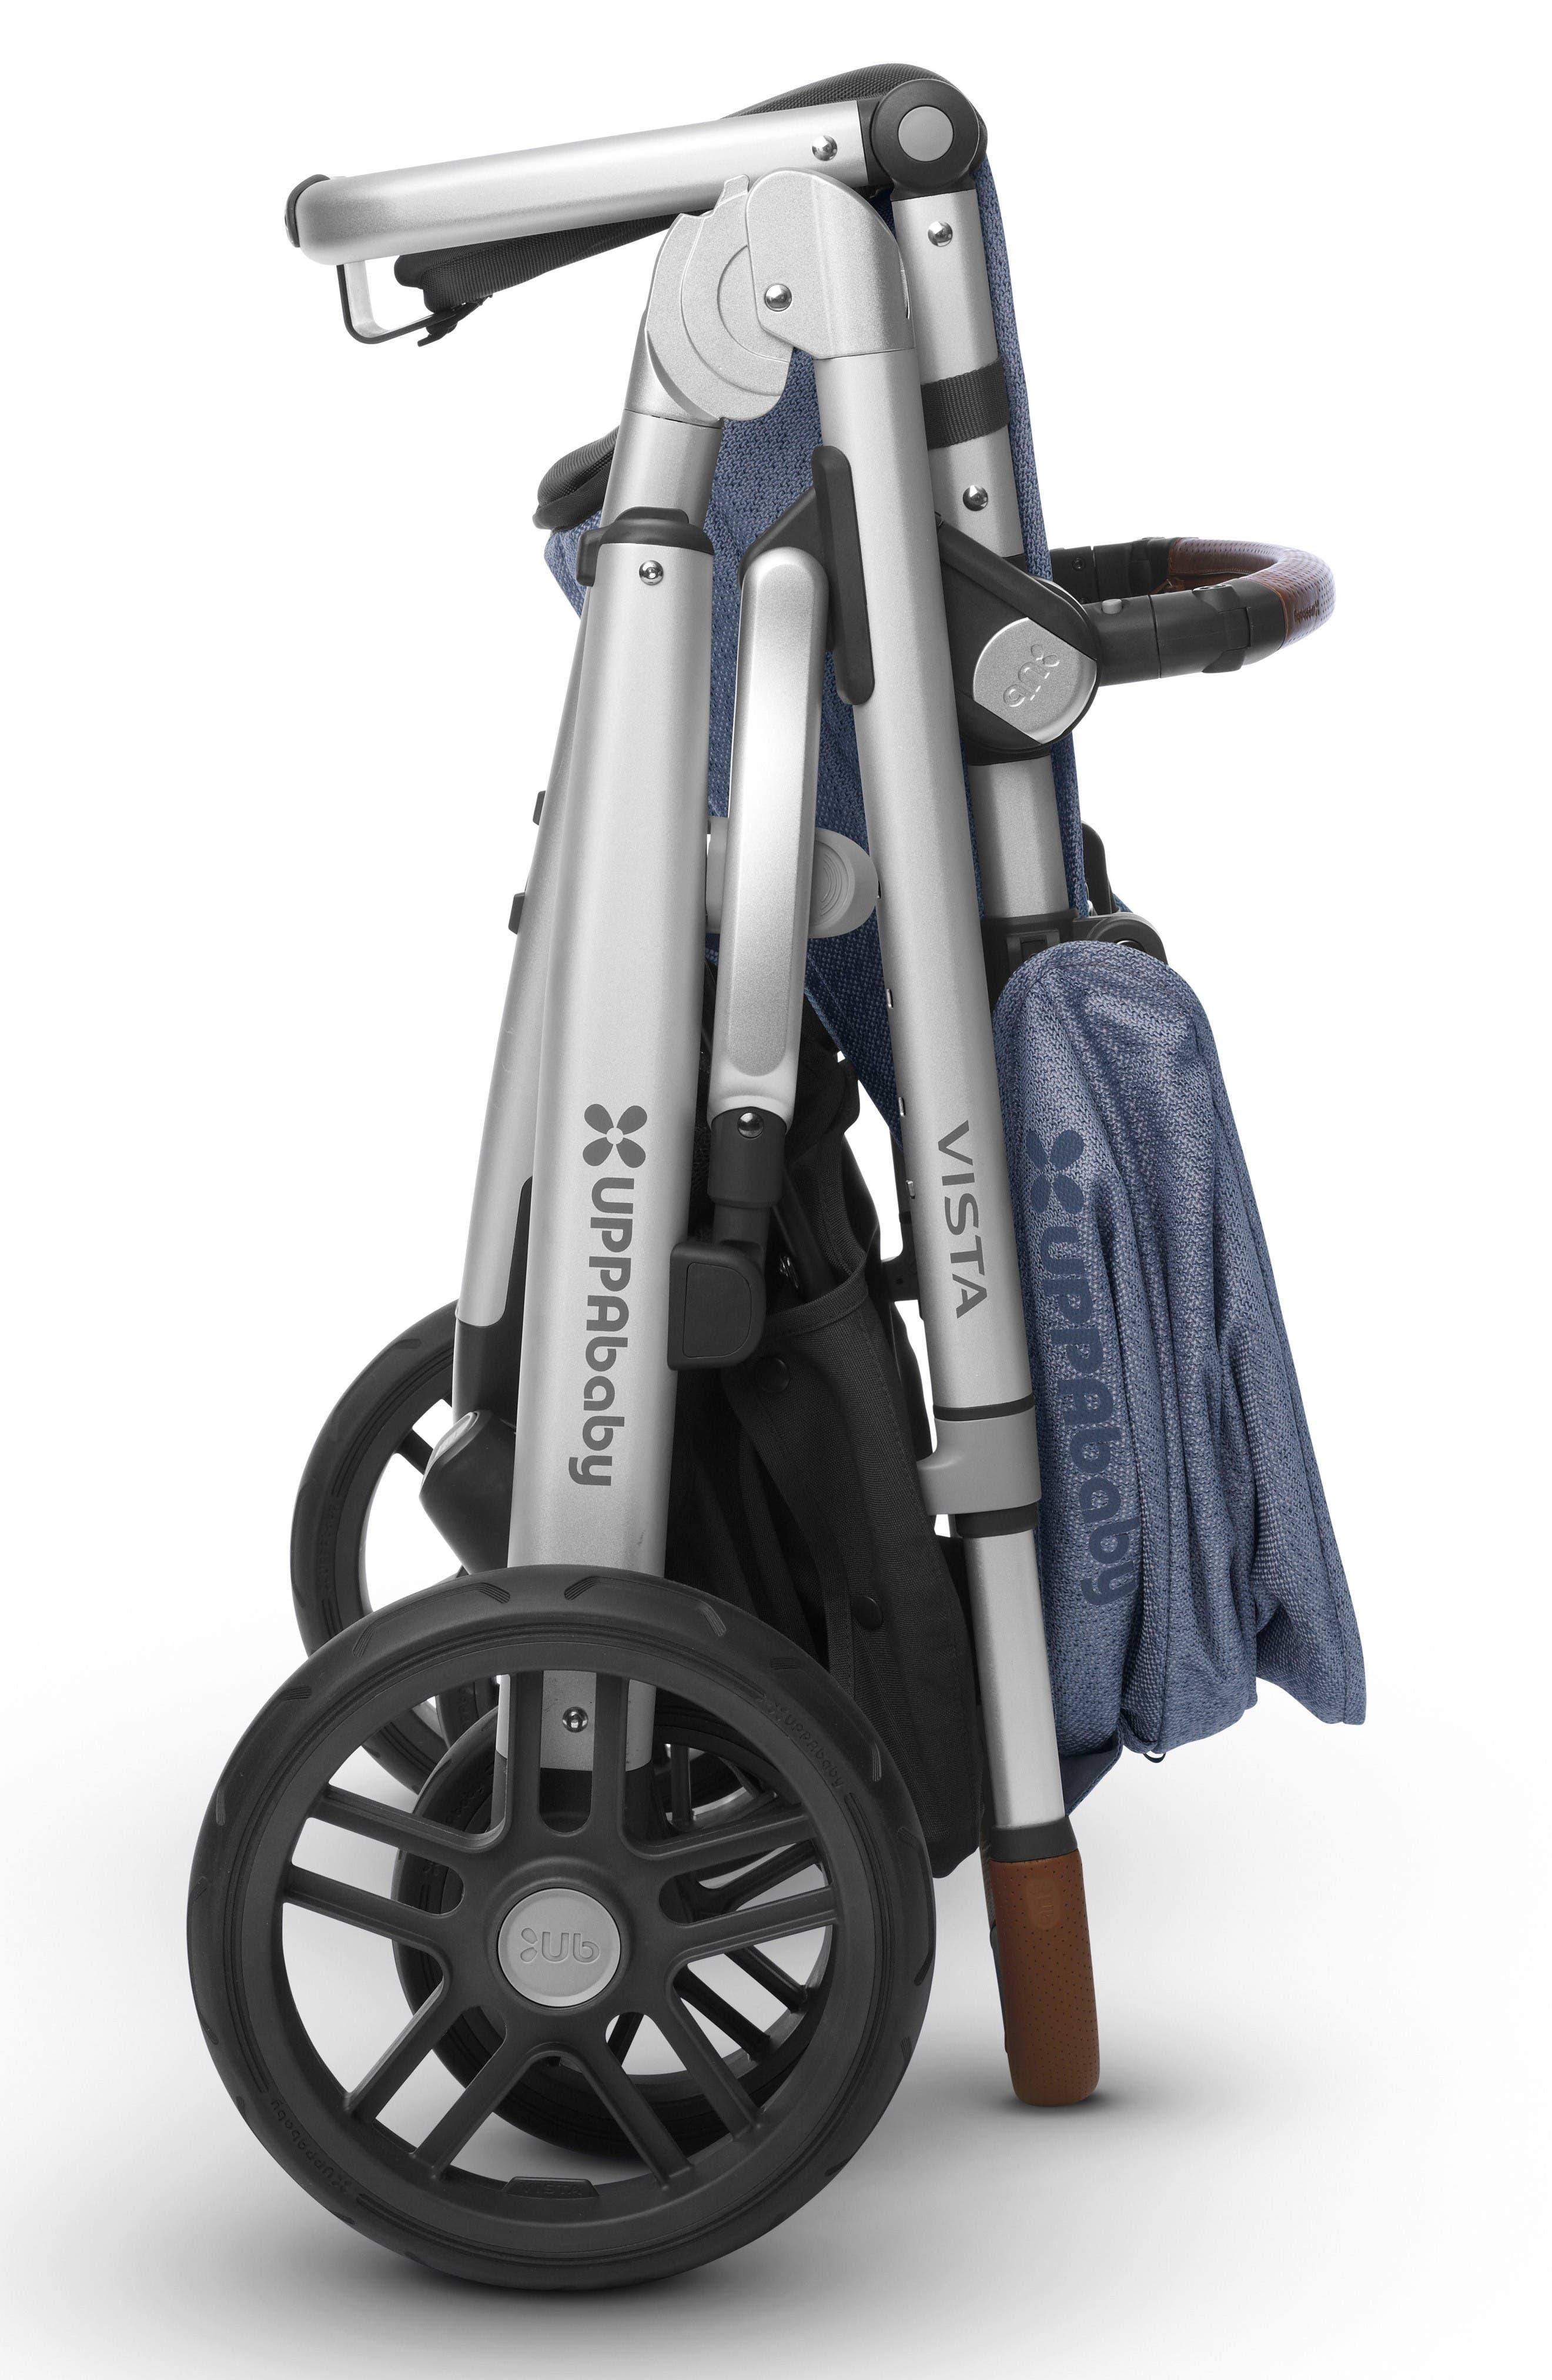 2017 VISTA Henry Aluminum Frame Convertible Stroller with Bassinet & Toddler Seat,                             Alternate thumbnail 4, color,                             Blue Marl